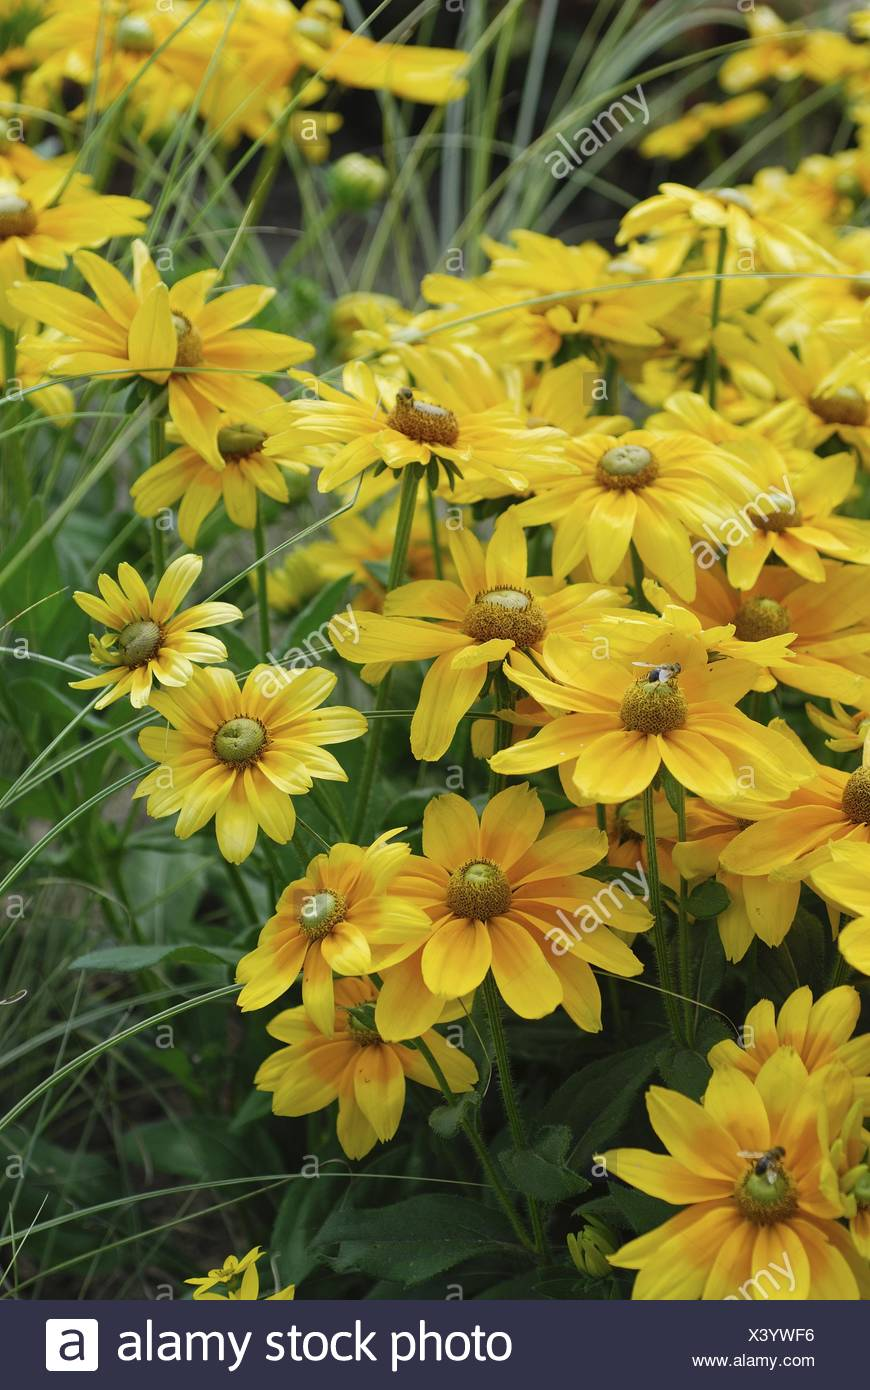 black-eyed susan, hairy coneflower, yellow daisy (Rudbeckia hirta 'Prarie Sun', Rudbeckia hirta Prarie Sun), cultivar Prarie Sun Stock Photo